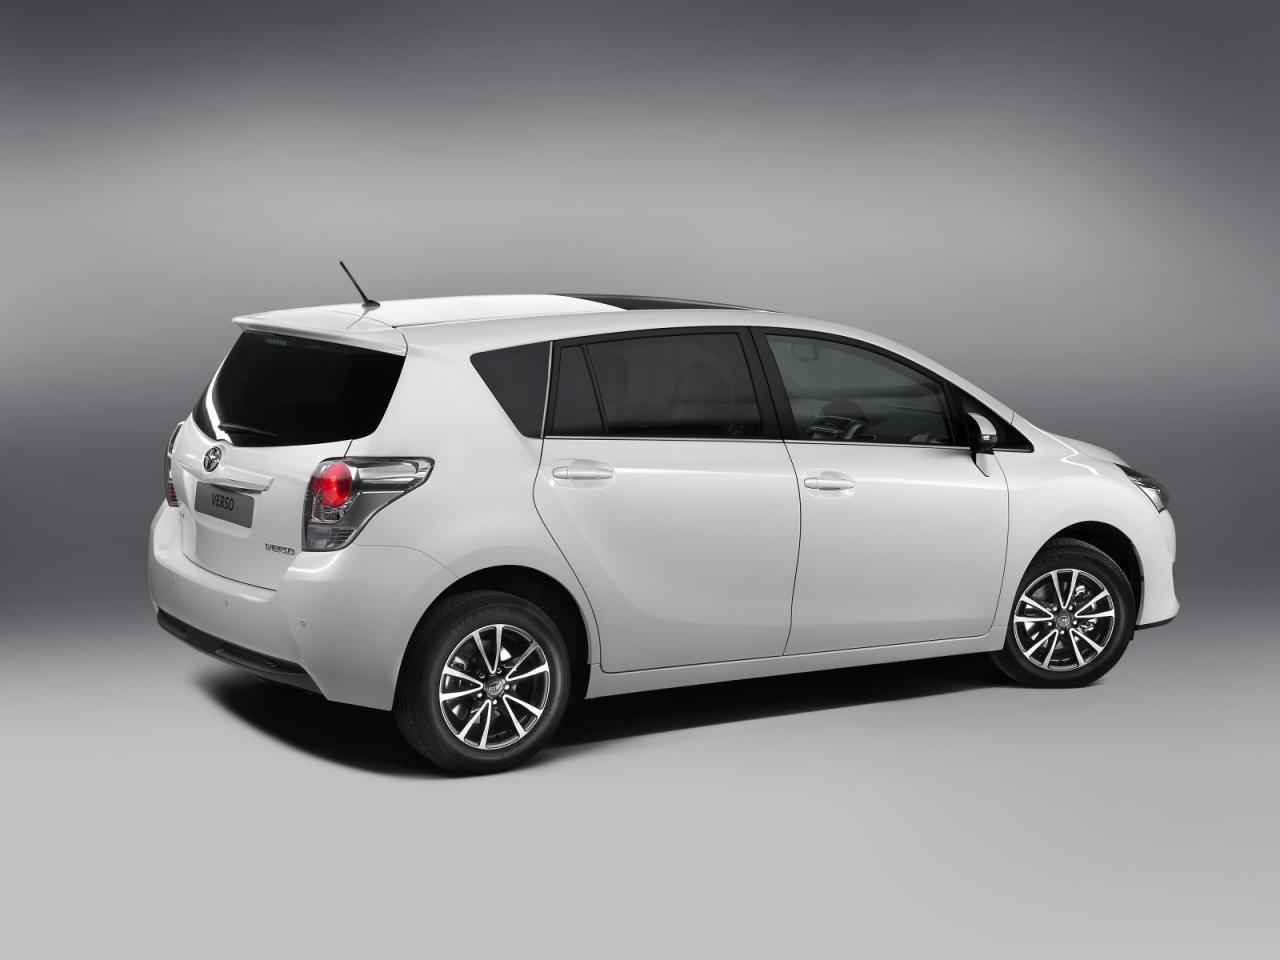 [Resim: Toyota+Verso+2.jpg]